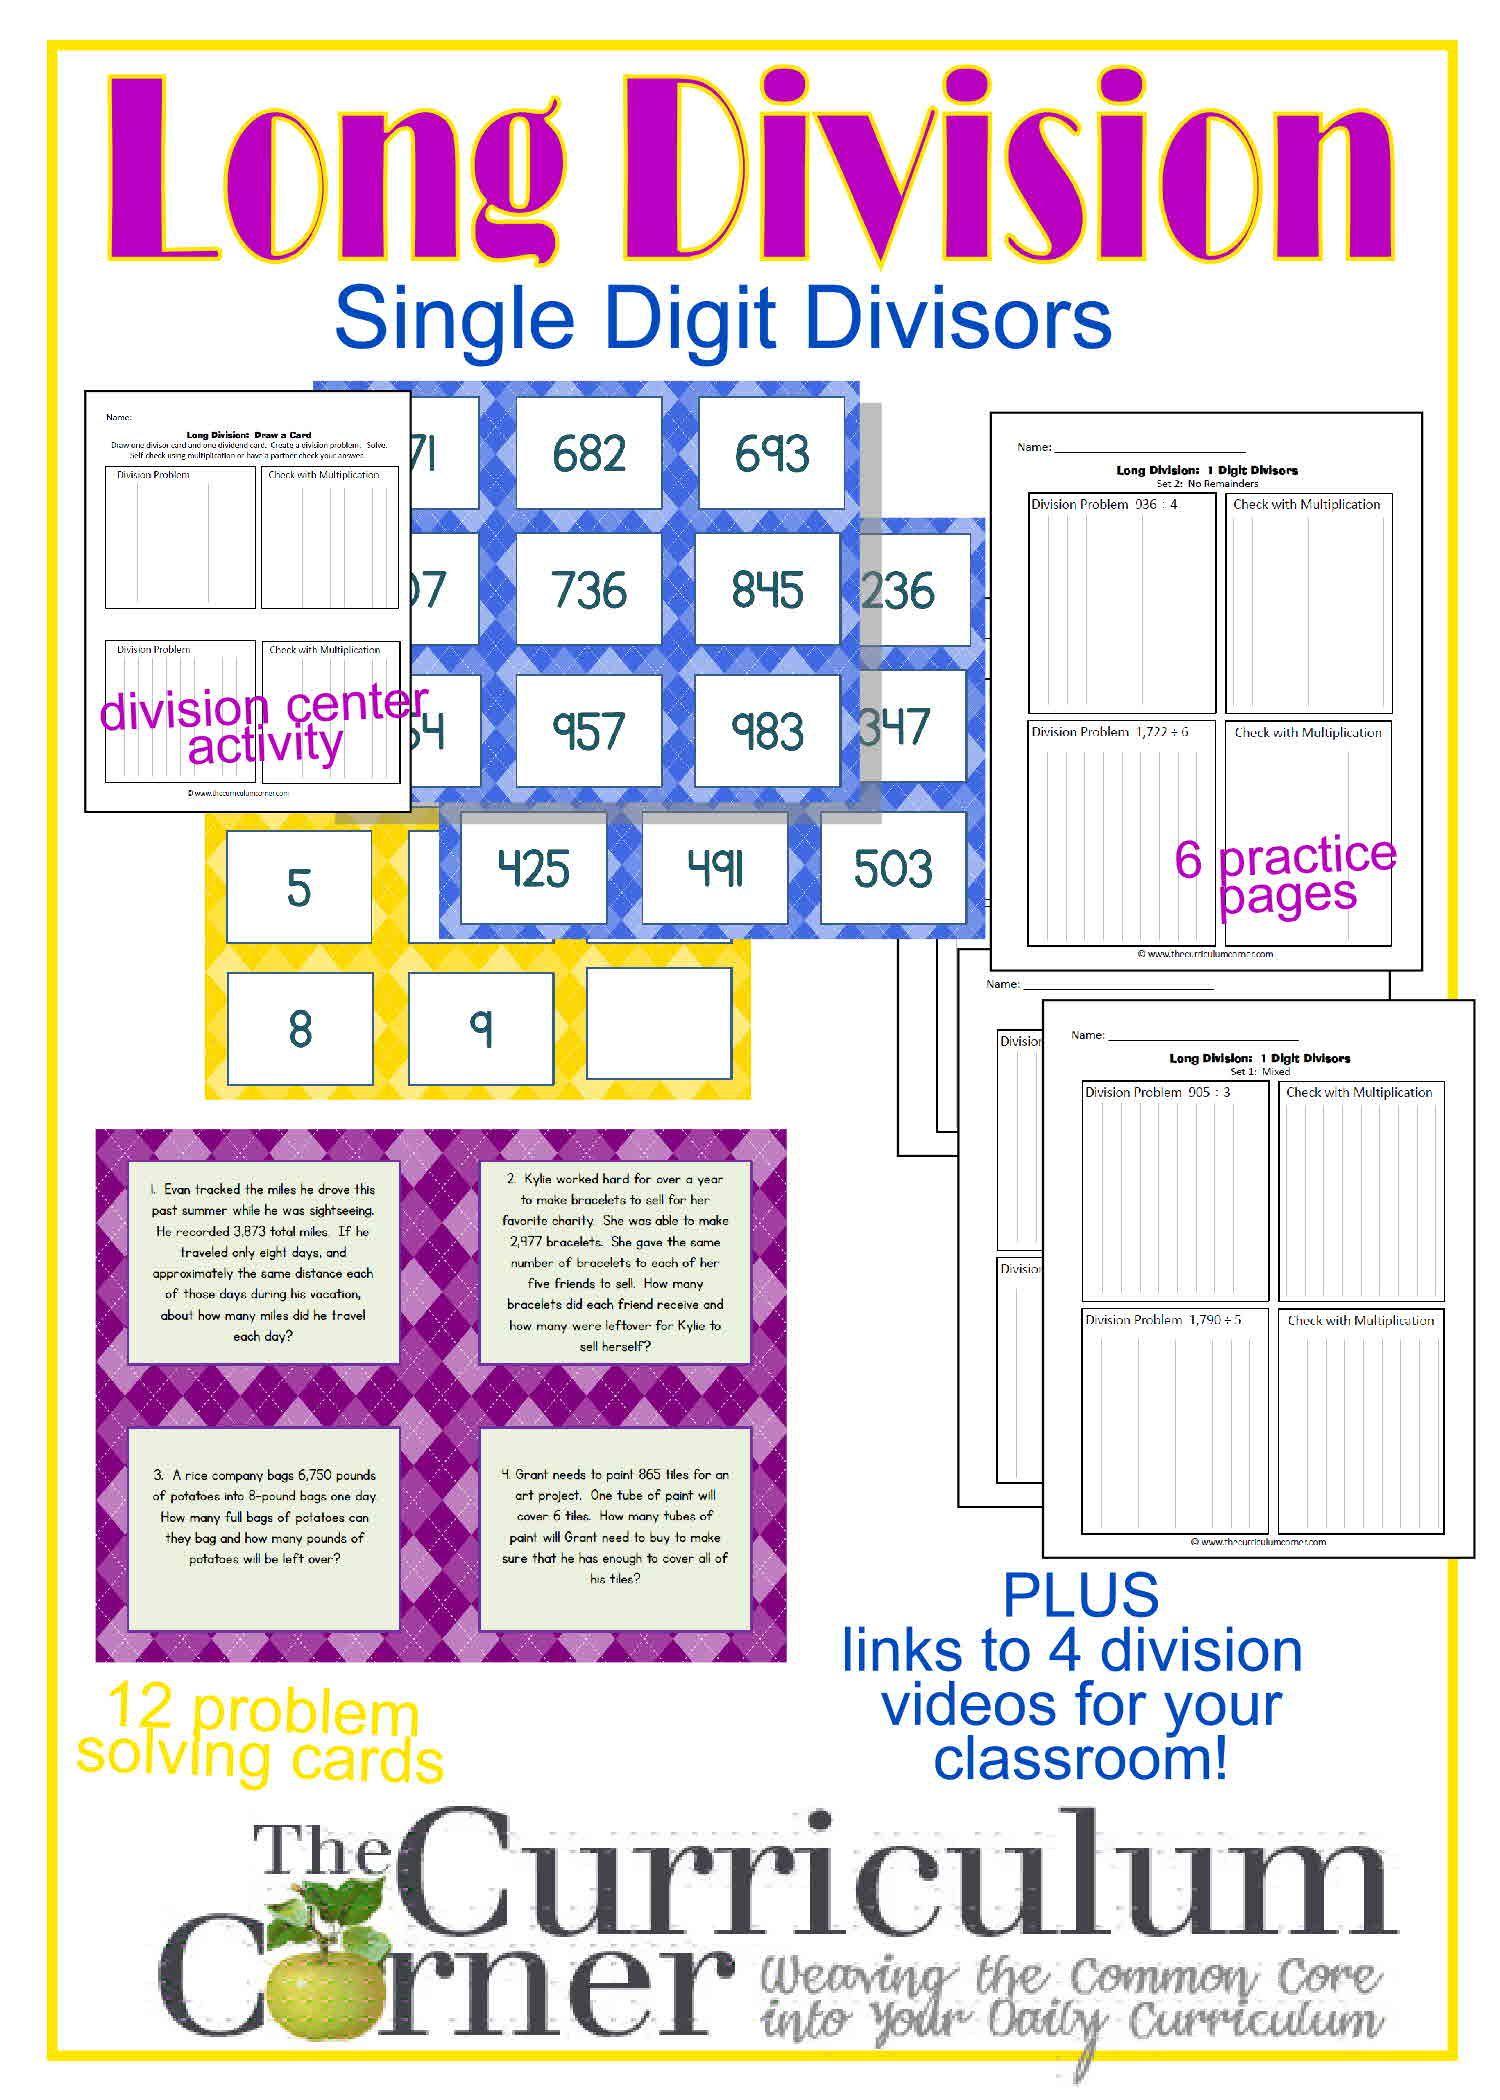 Long Division Resources 1 Digit Divisor